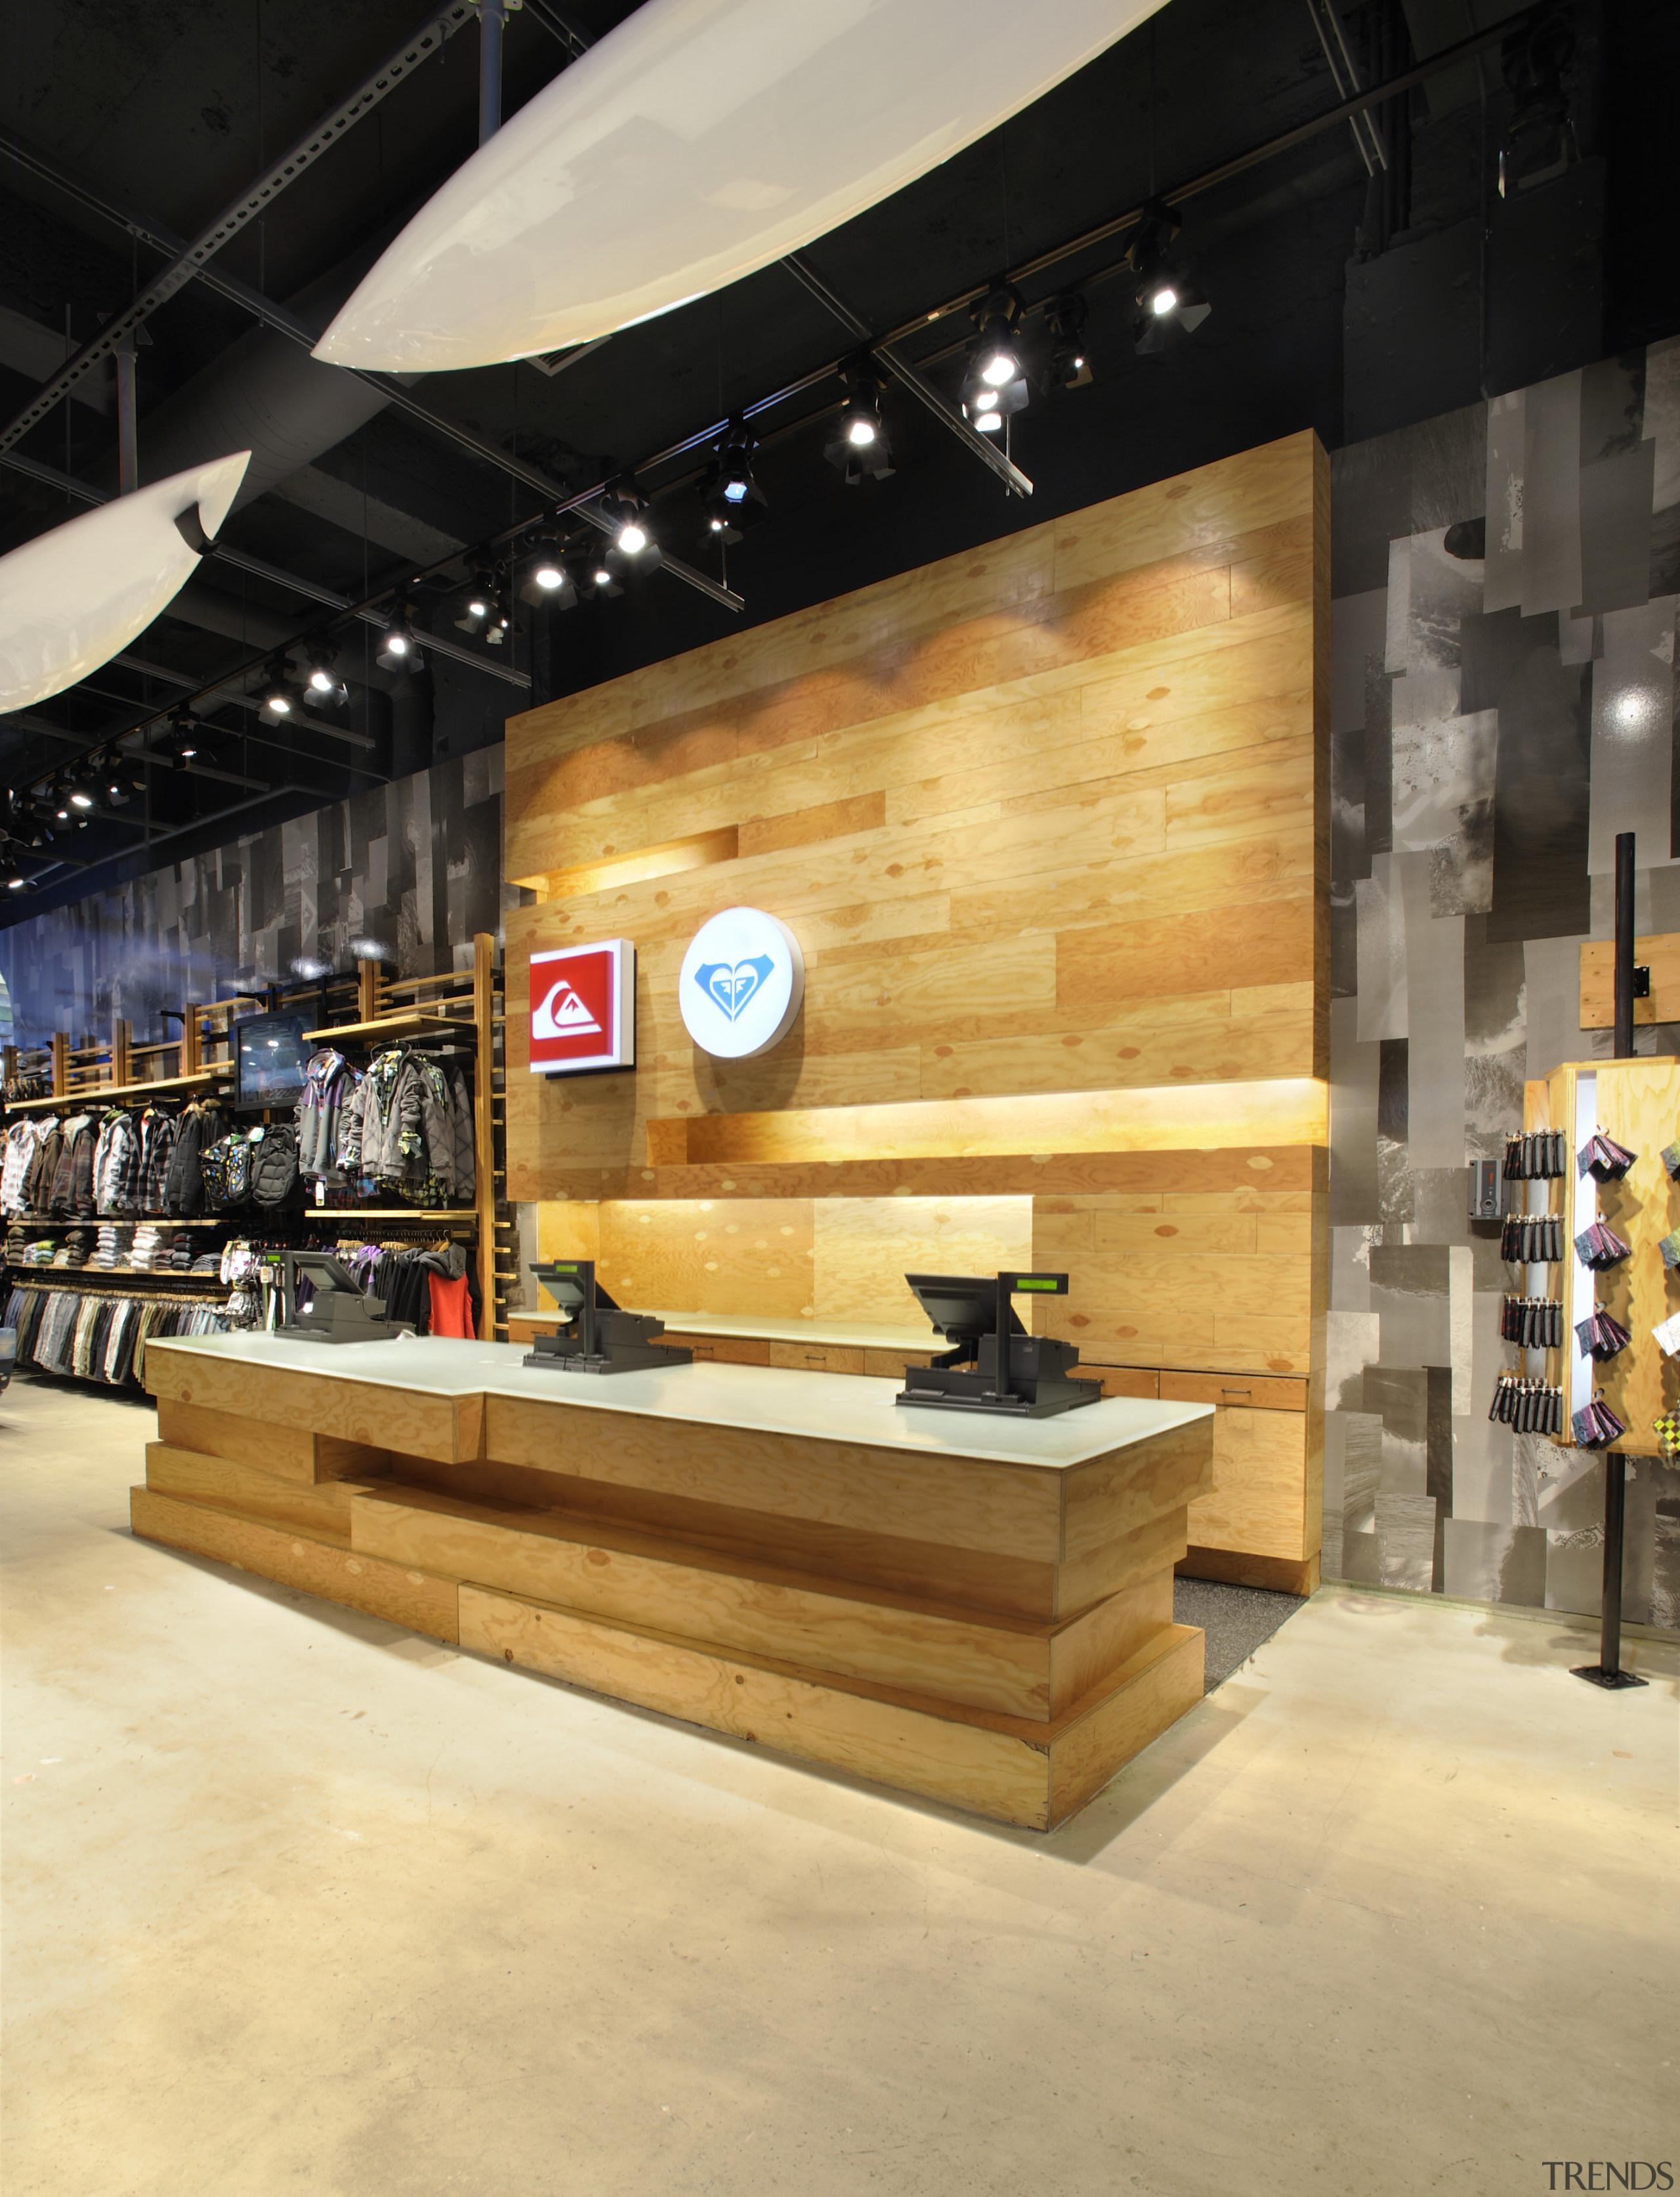 Interior view of the Quicksilver store in New interior design, retail, shoe store, wood, orange, black